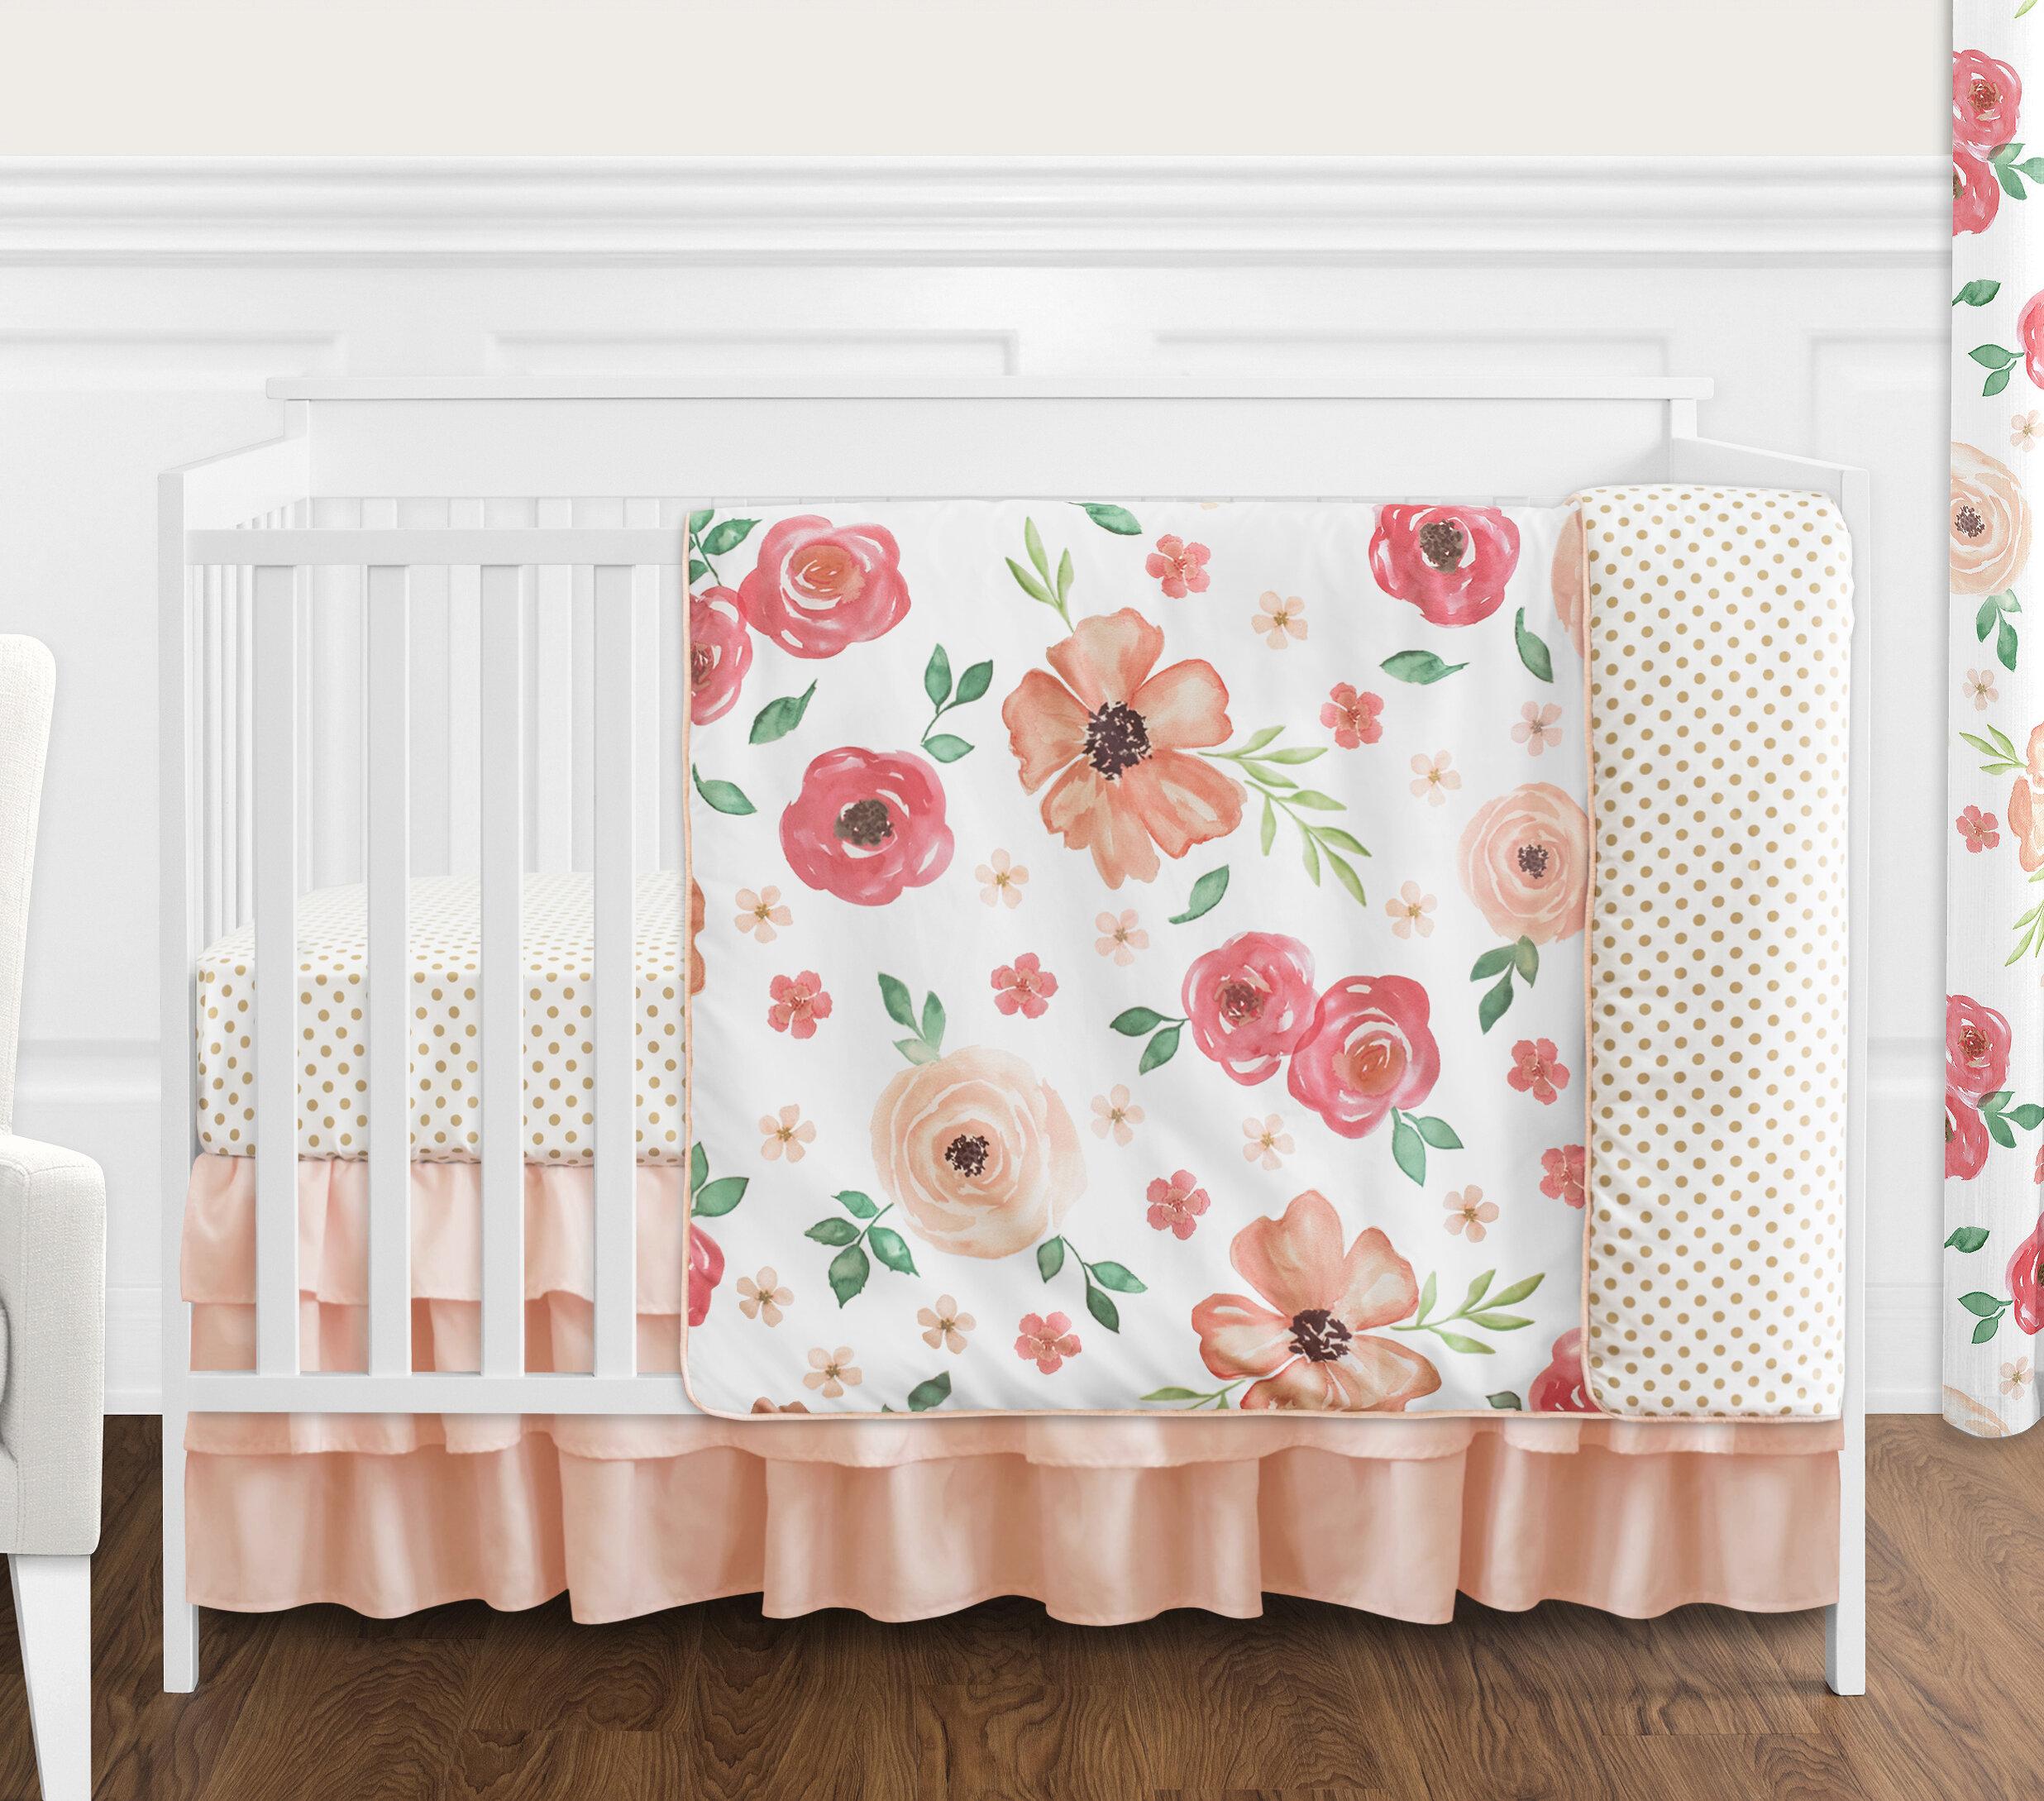 Sweet Jojo Designs Watercolor Floral 4 Piece Crib Bedding Set Reviews Wayfair